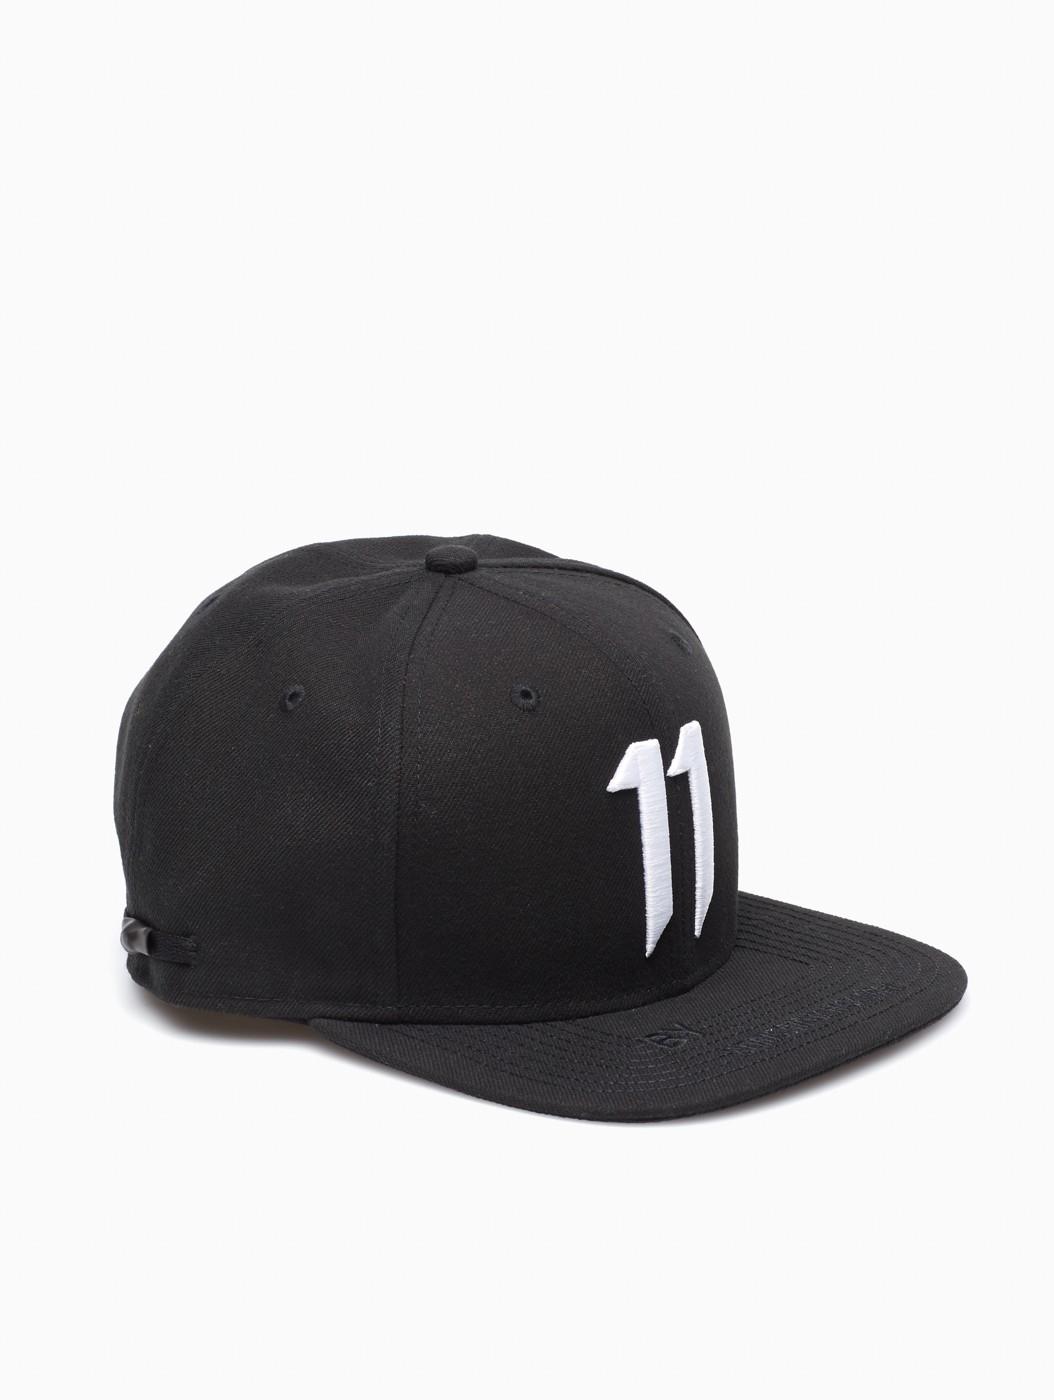 Lyst - Boris Bidjan Saberi 11 Cap in Black for Men 53e76cadc1ea